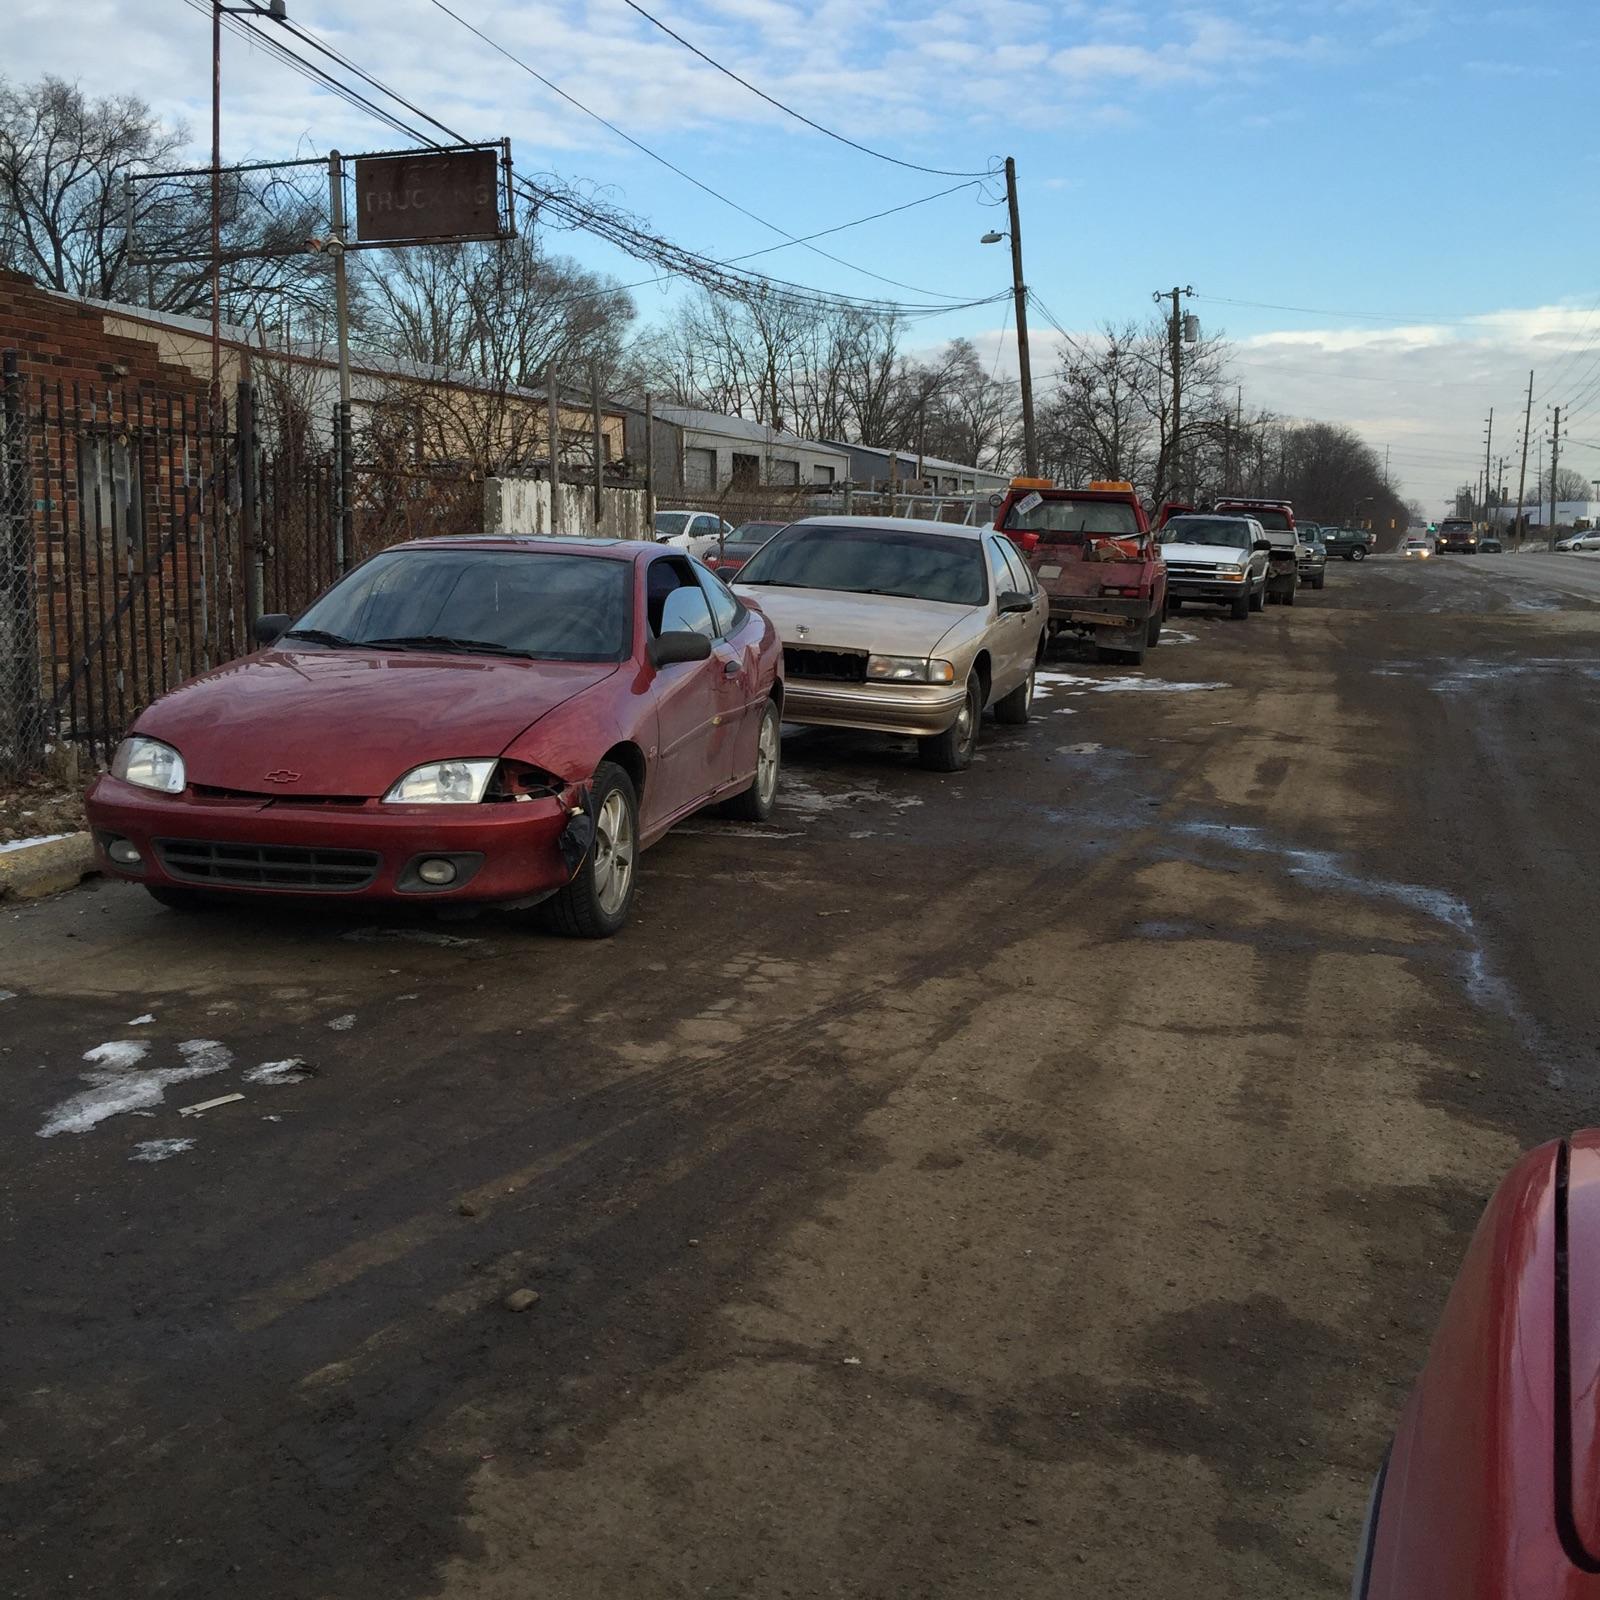 Pick A Part Indianapolis: Indianapolis Junk Cars